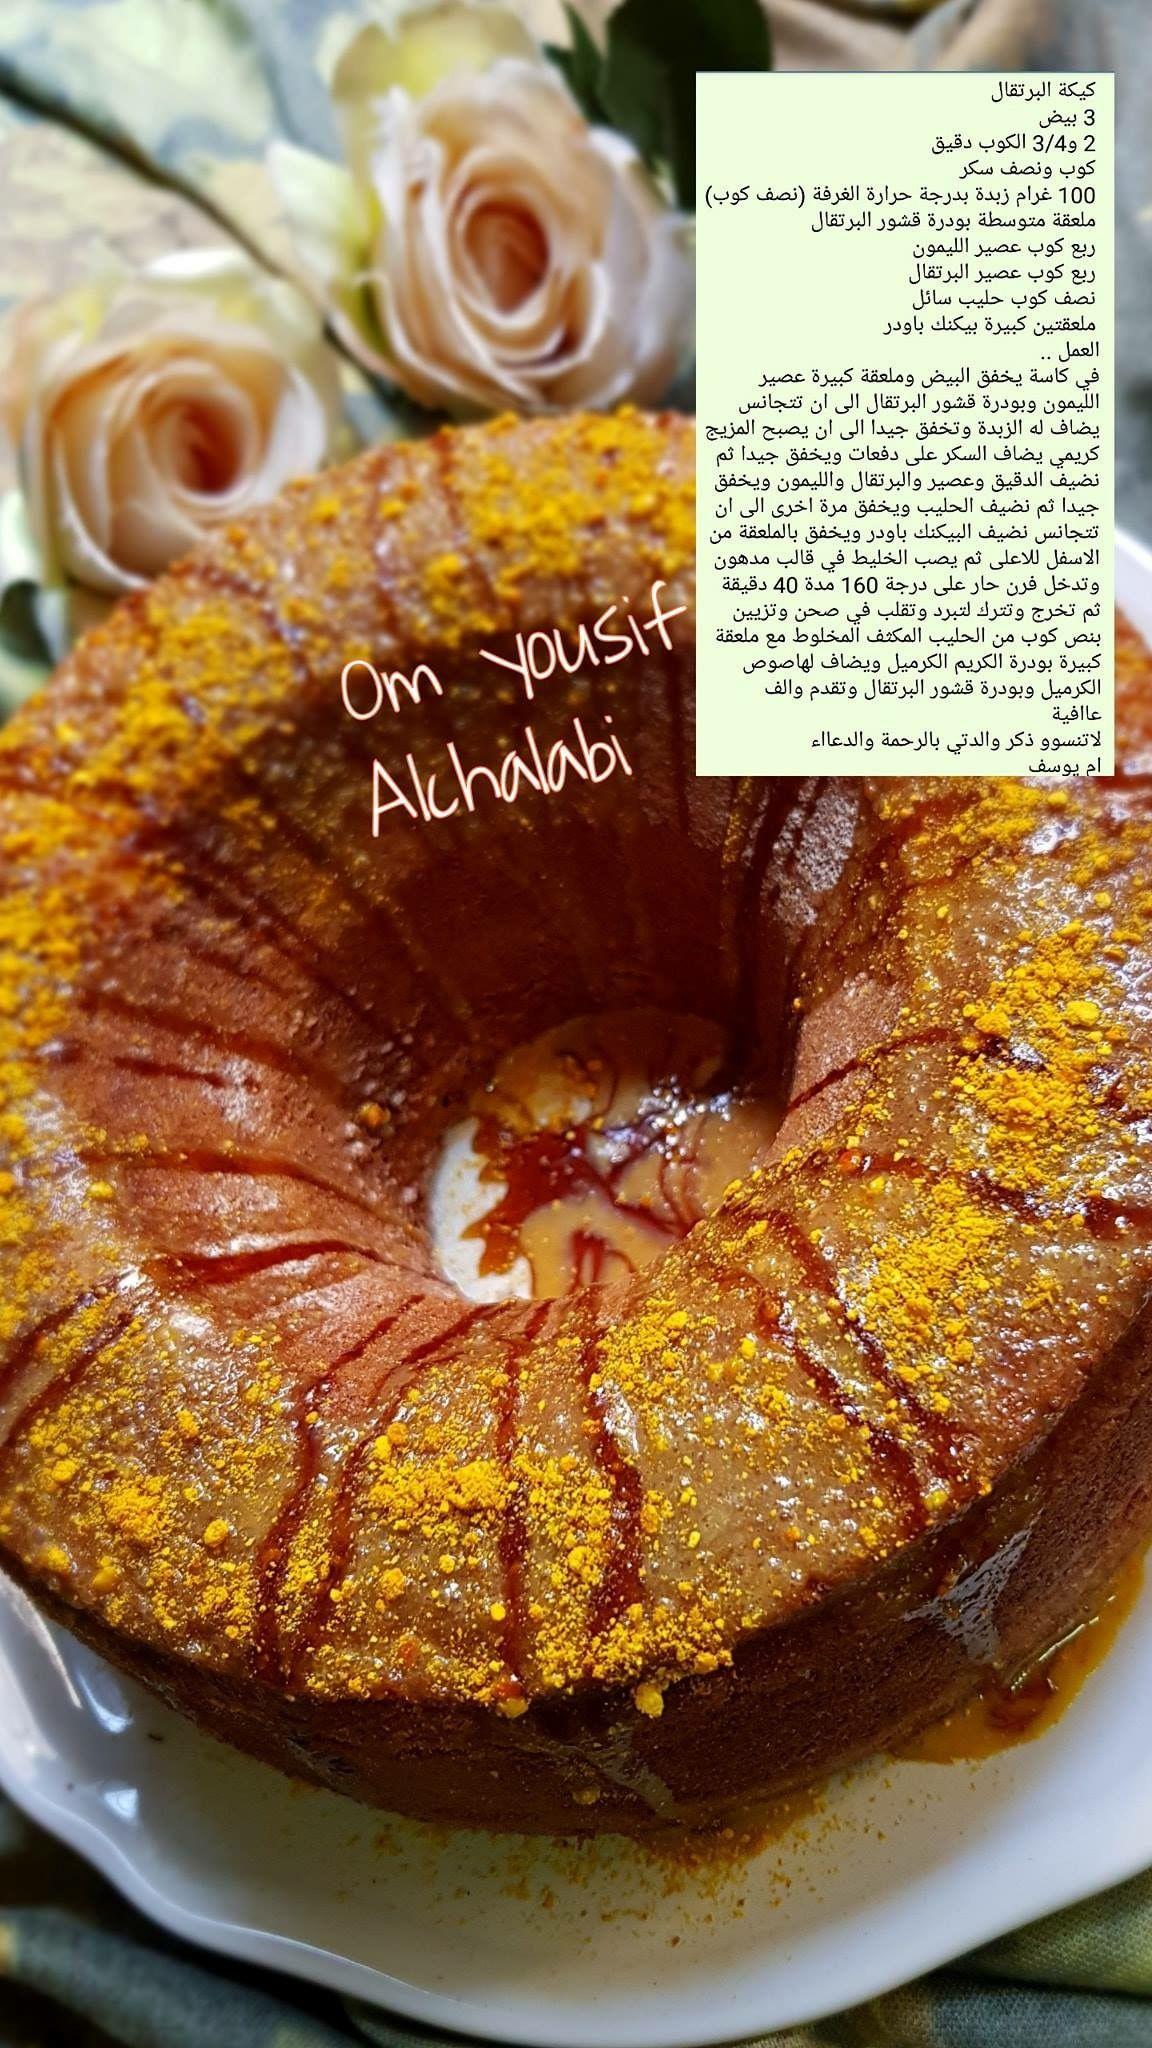 كيكة البرتقال Food Drinks Dessert Sweets Recipes Coffee Cake Easy